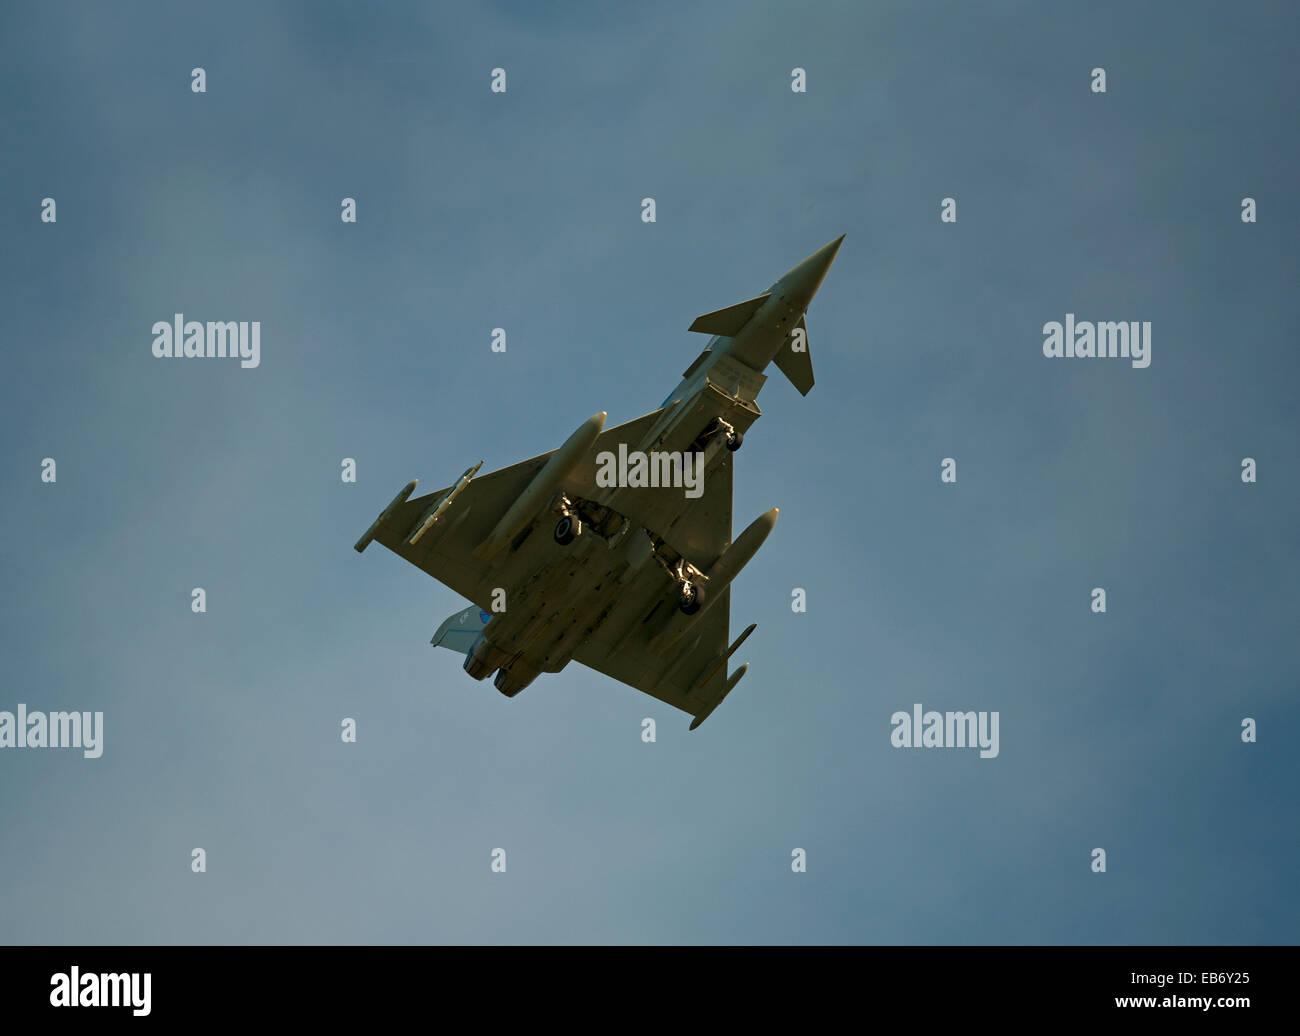 Eurofighter Typhoon FRG4 Military Fast Jet Fighter. SCO 9195. - Stock Image